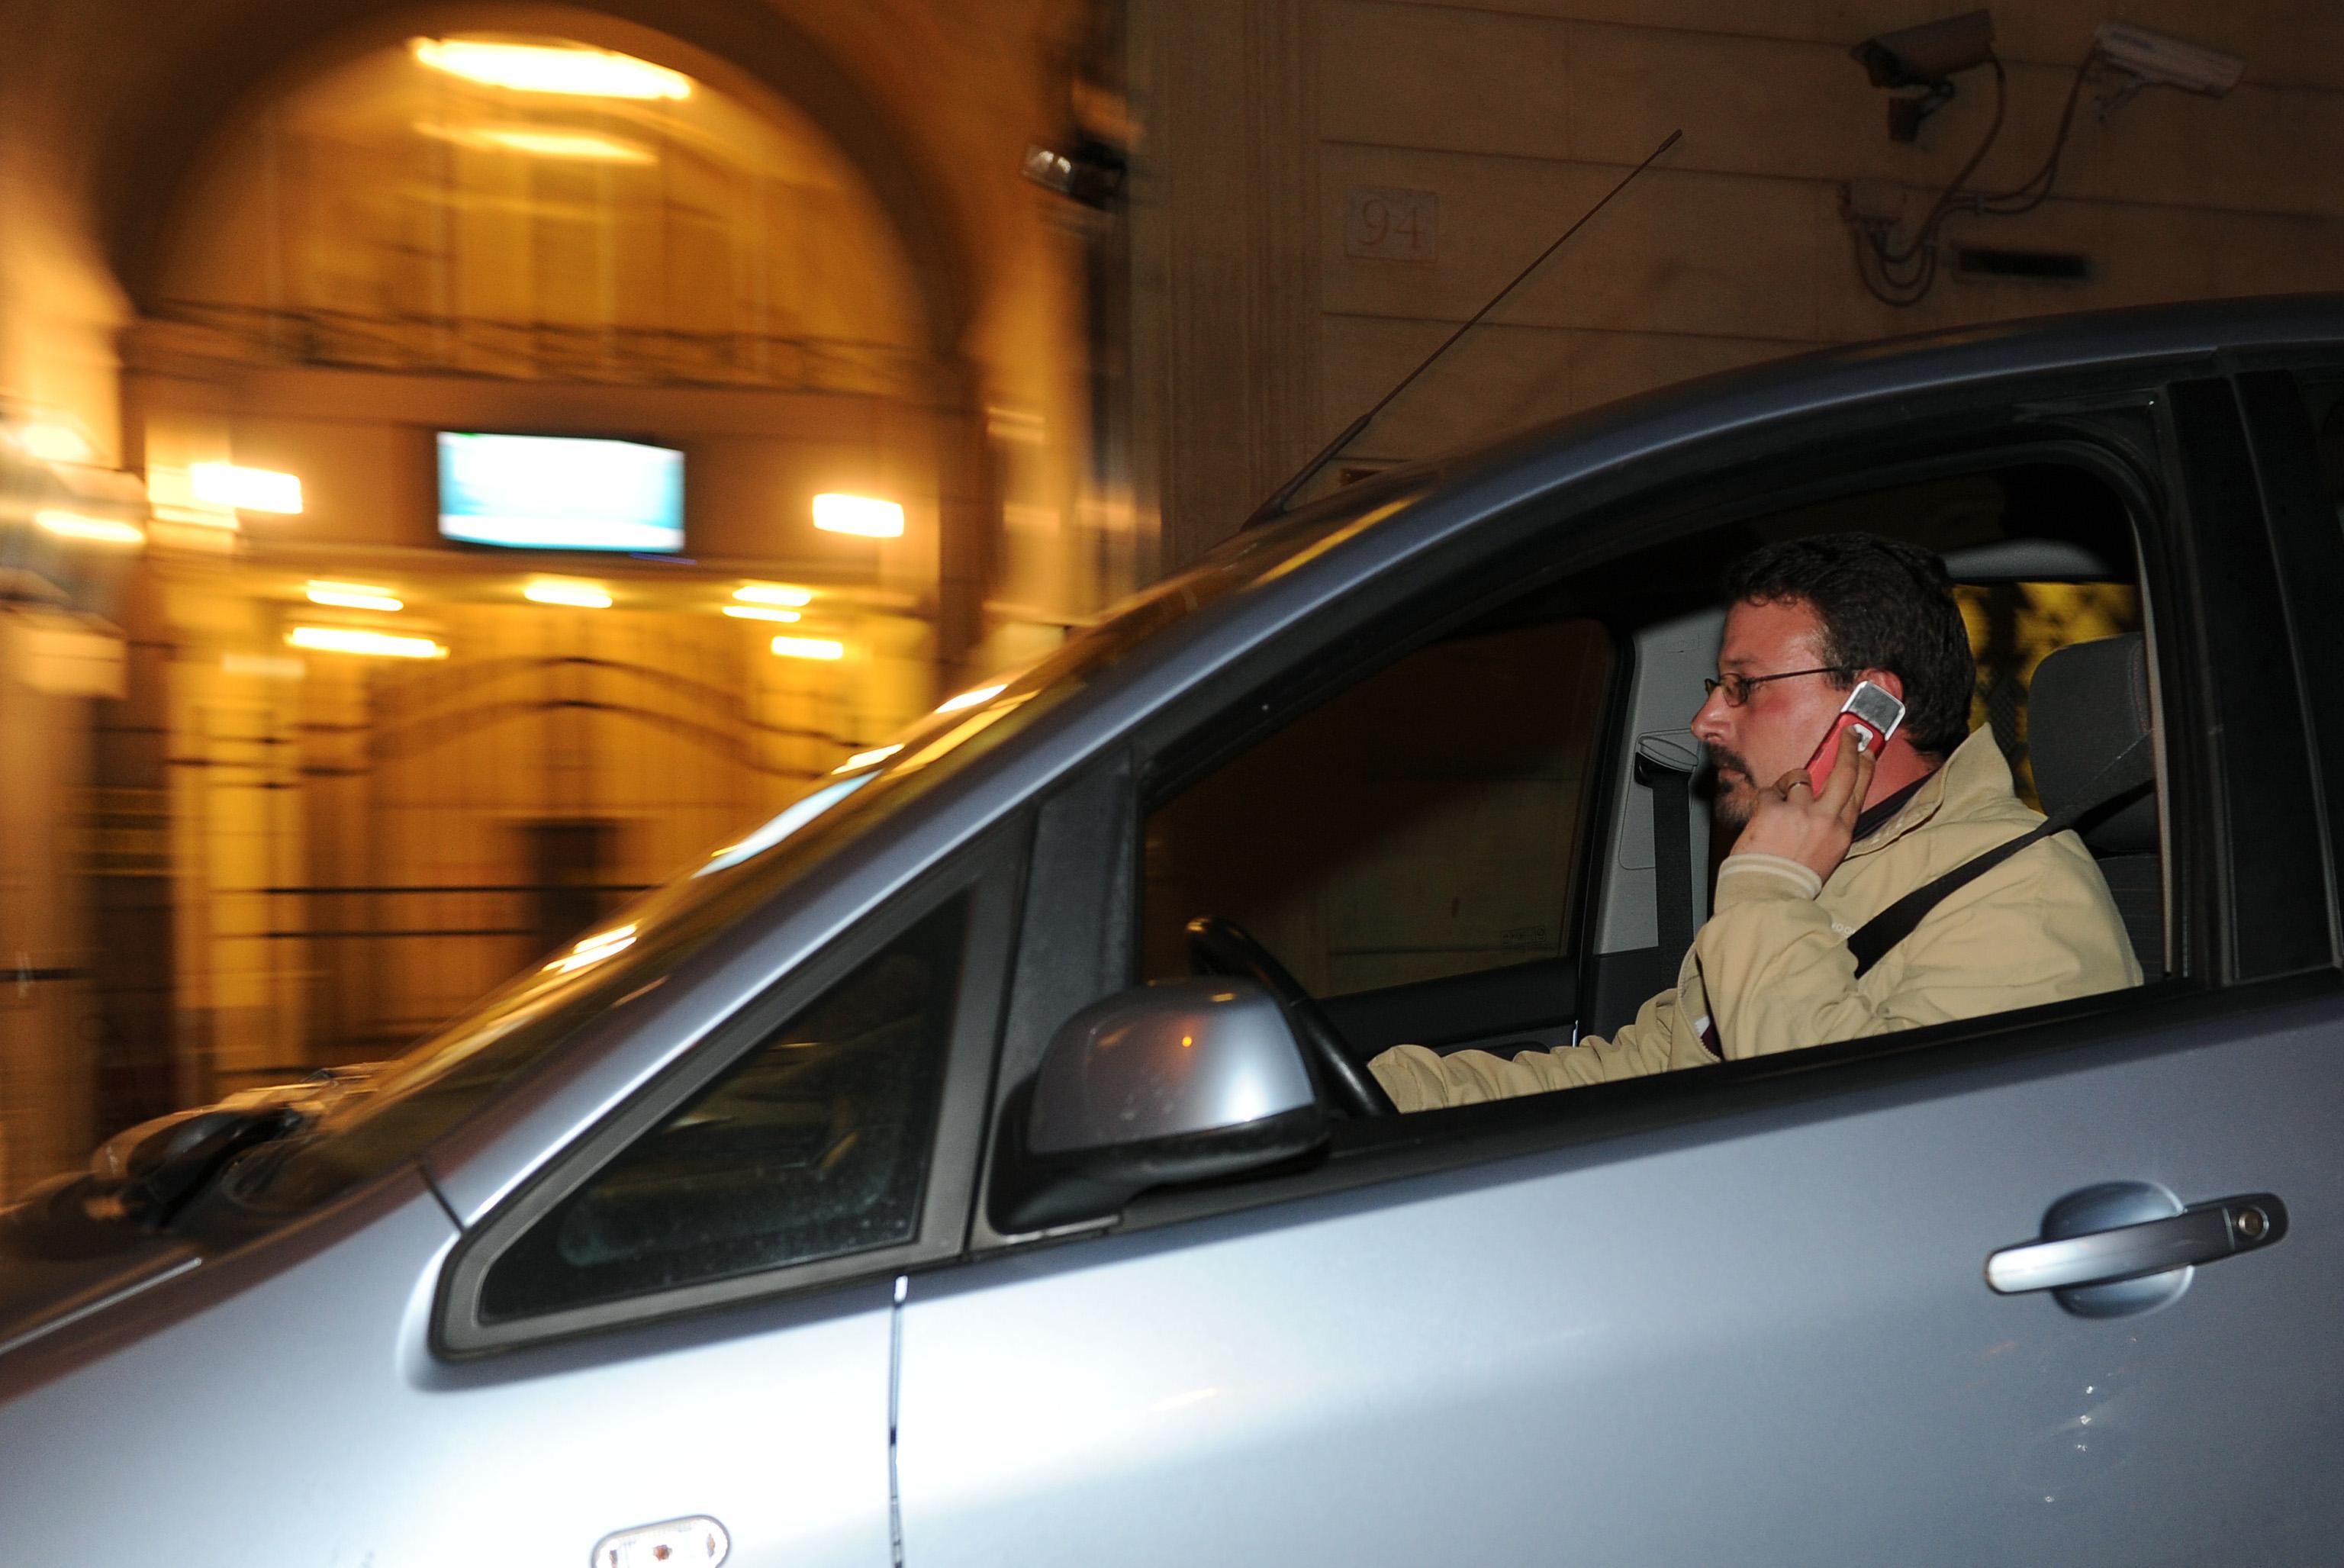 Manovra,salta stretta su cellulari auto